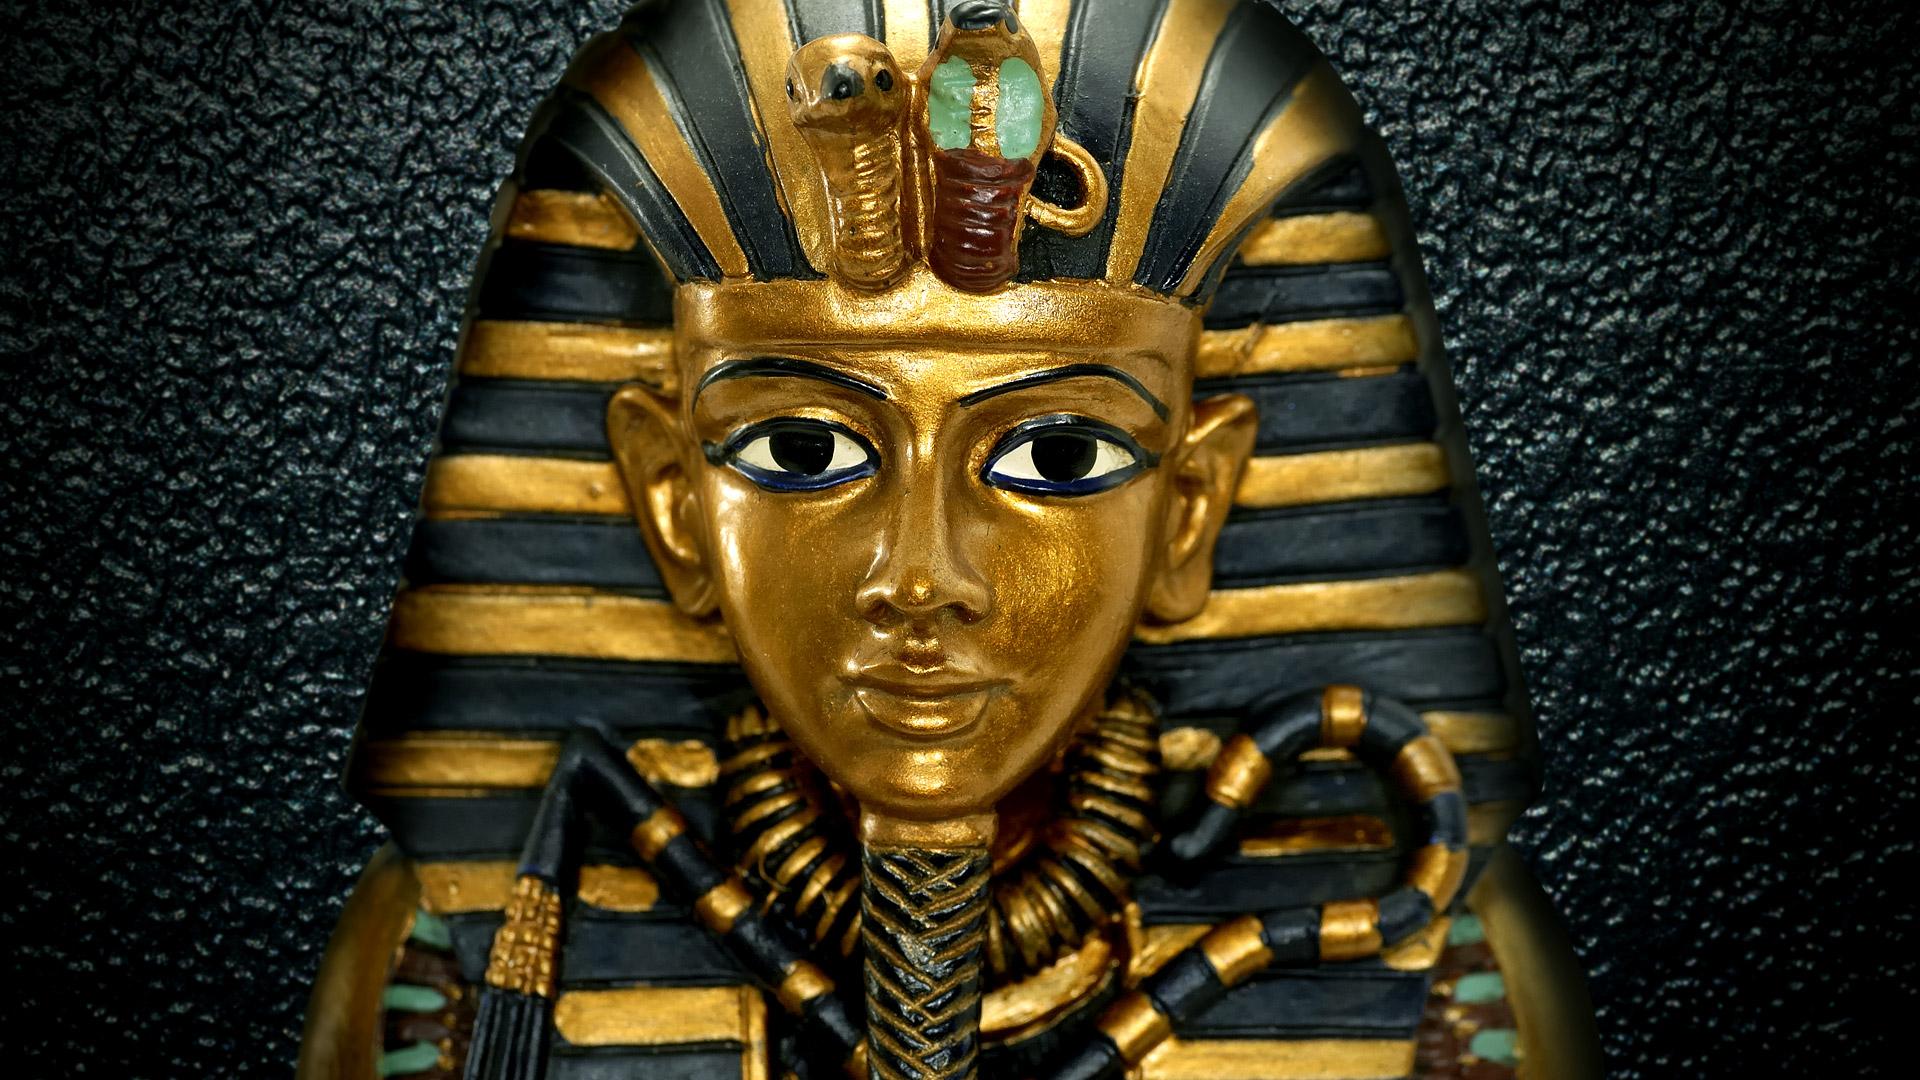 Egyptian Mummy sarcophagus